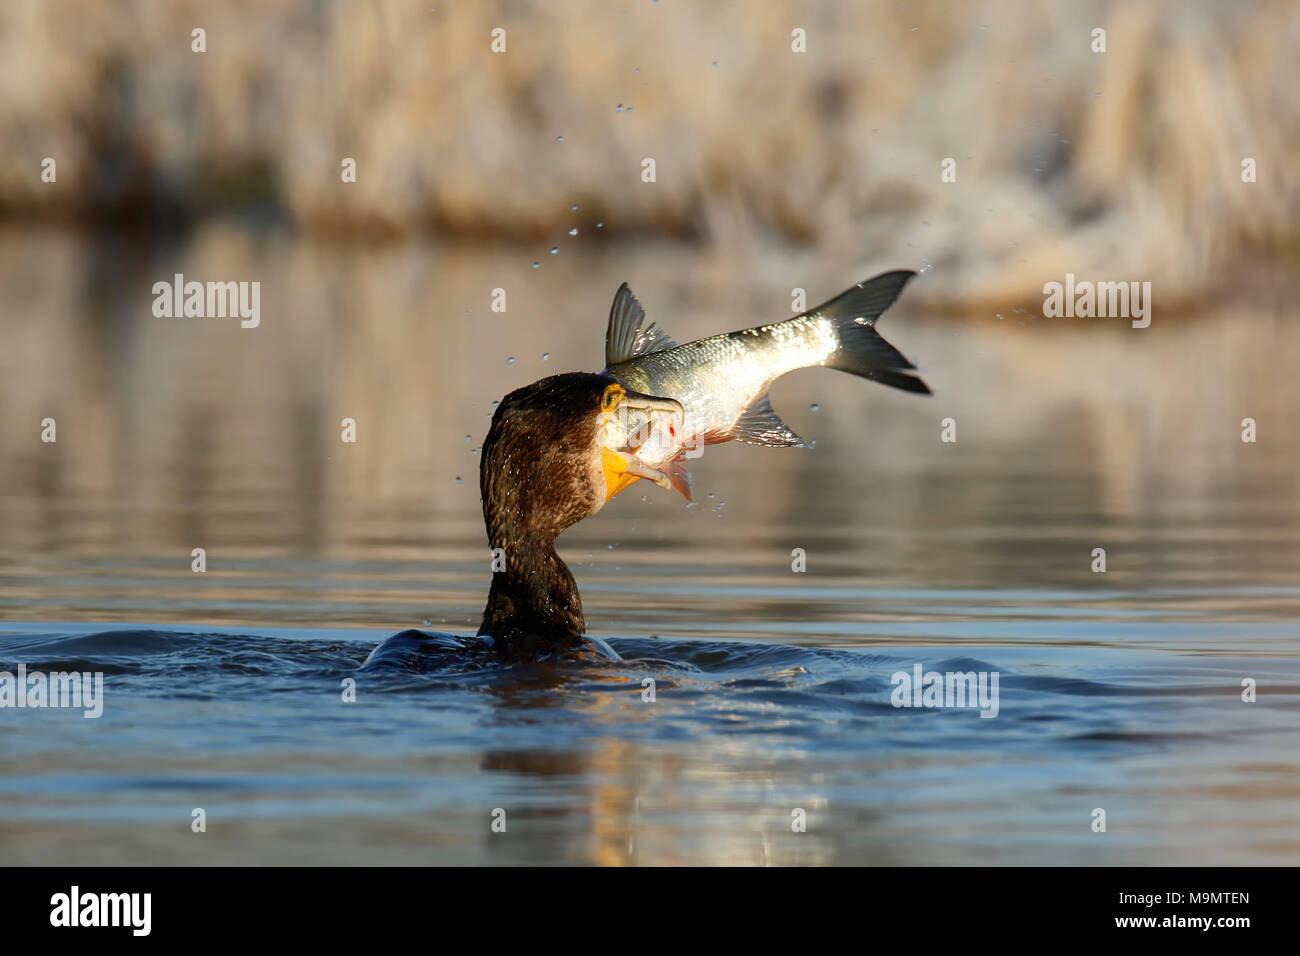 Great cormorant (Phalacrocorax carbo) with fish as prey, Biosphere Reserve Middle Elbe, Dessau-Roßlau, Saxony-Anhalt, Germany - Stock Image